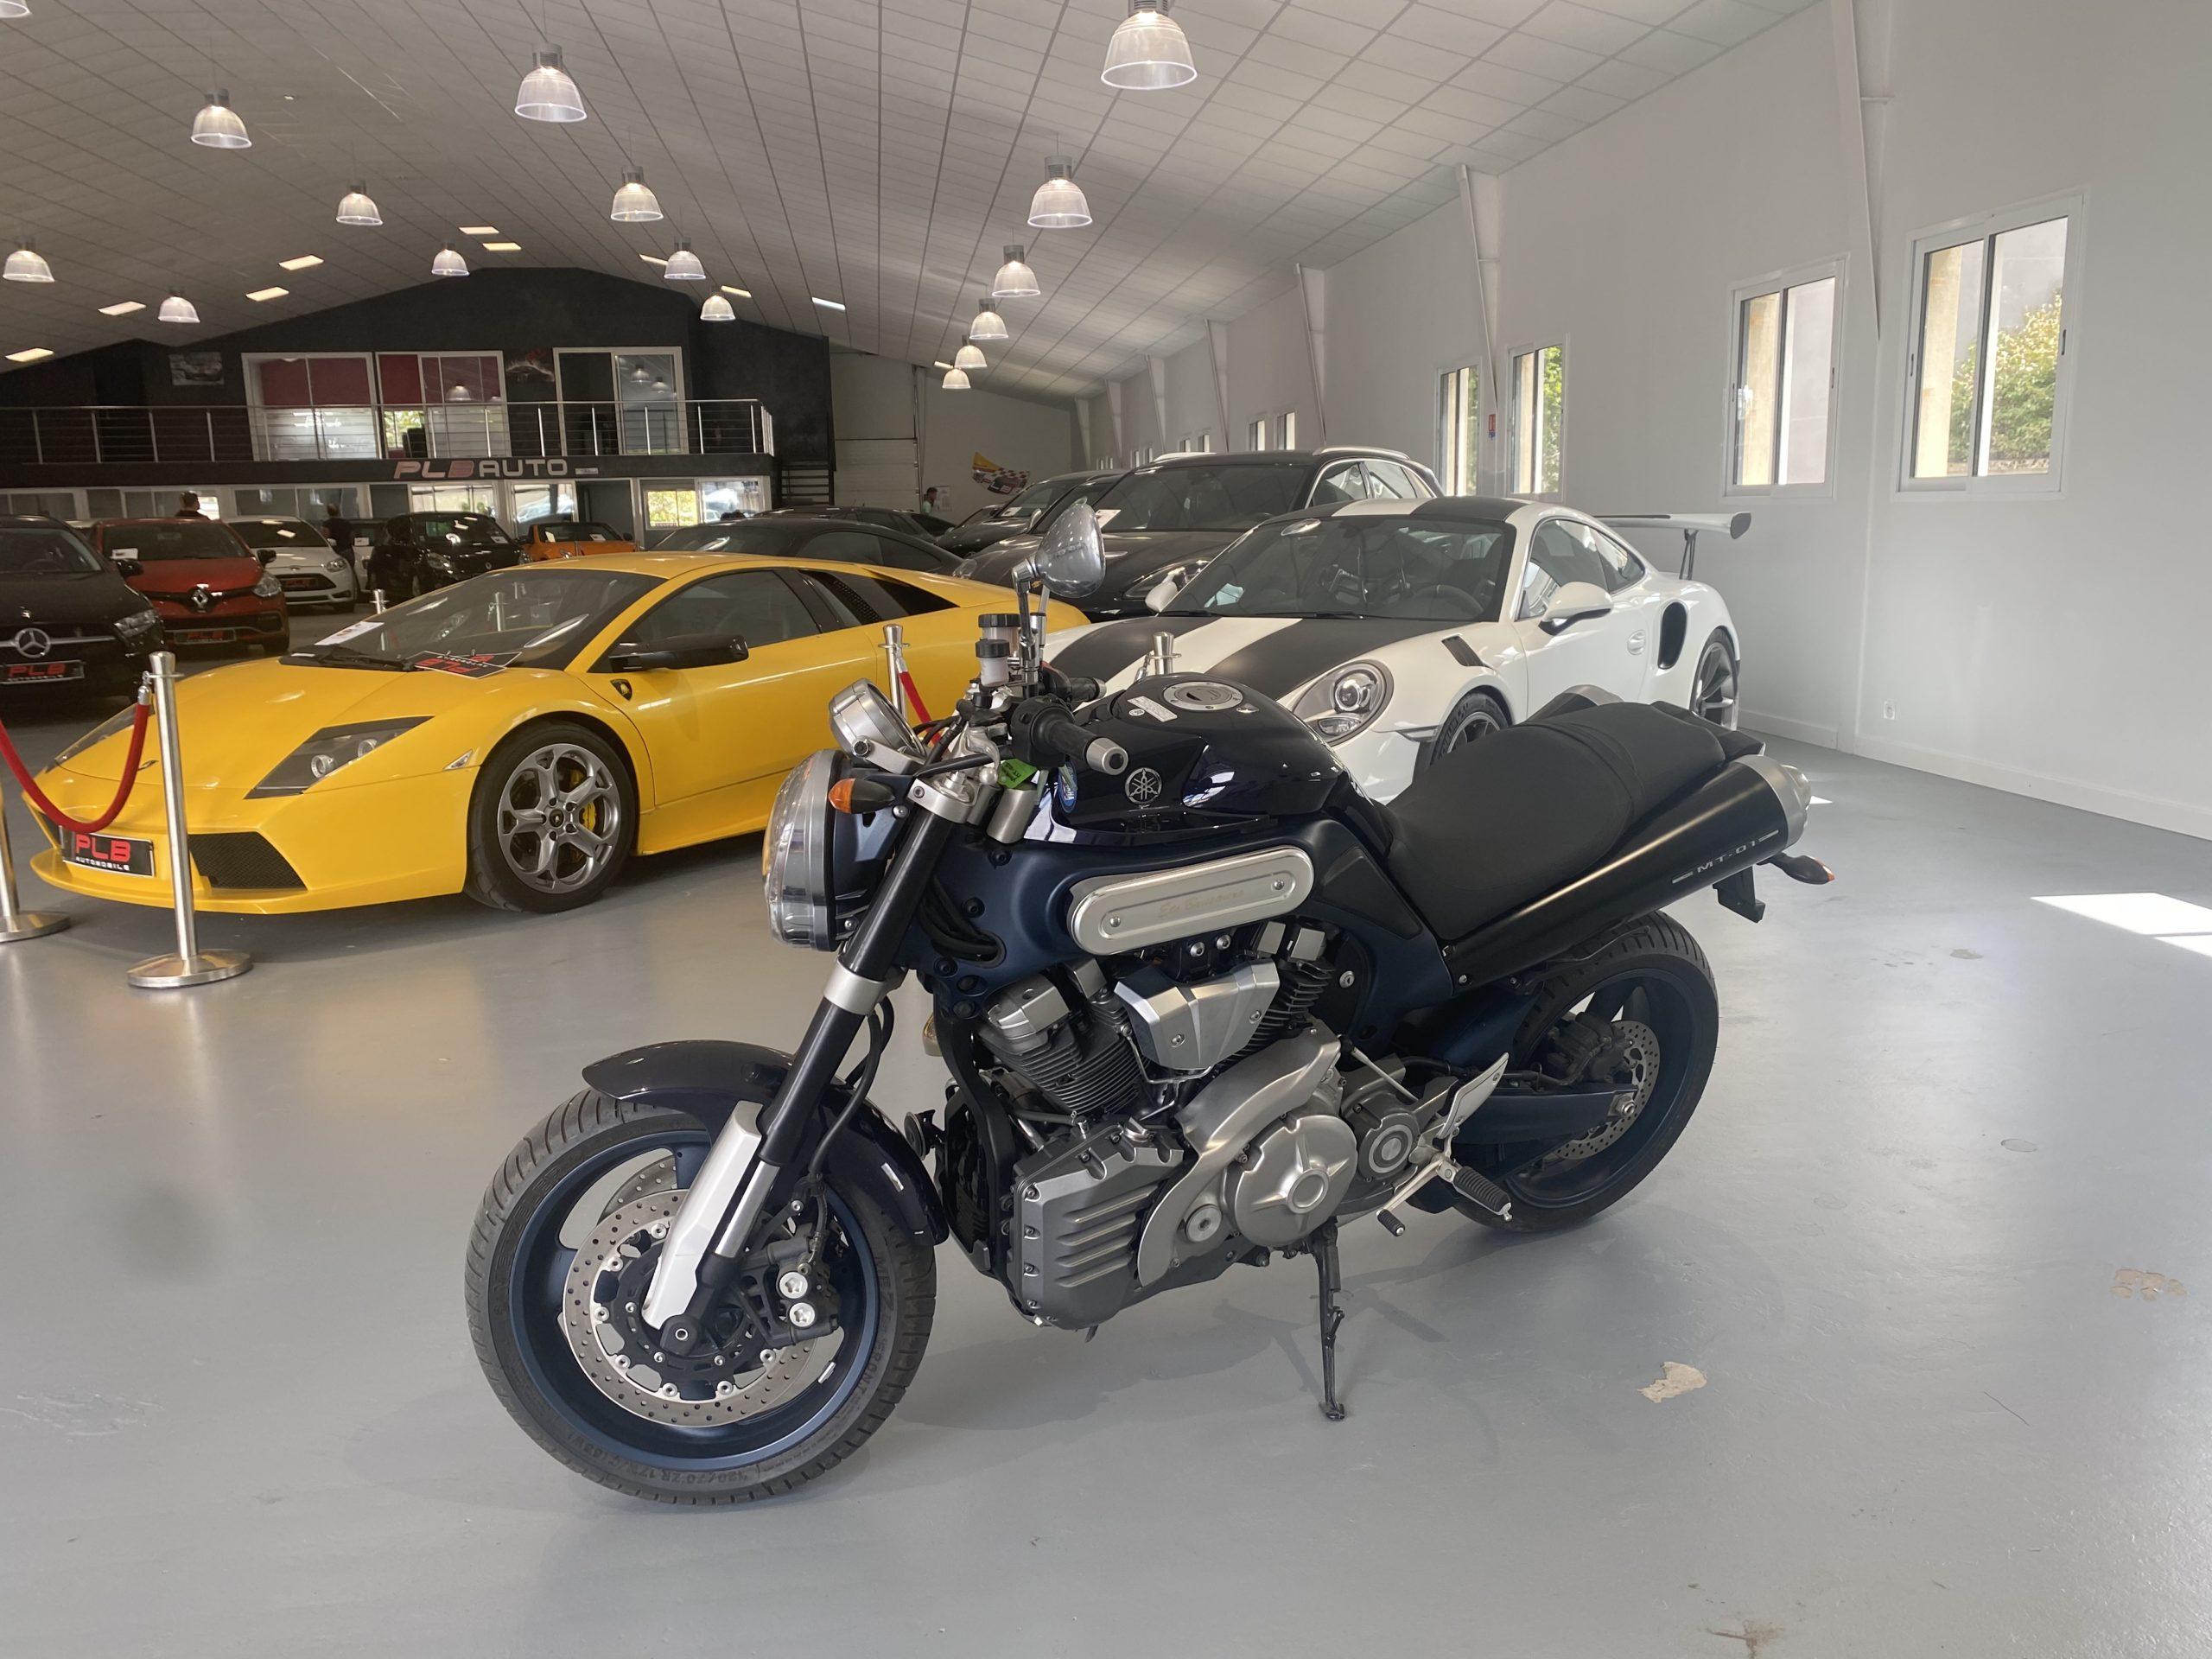 Yamaha mt-01 1700